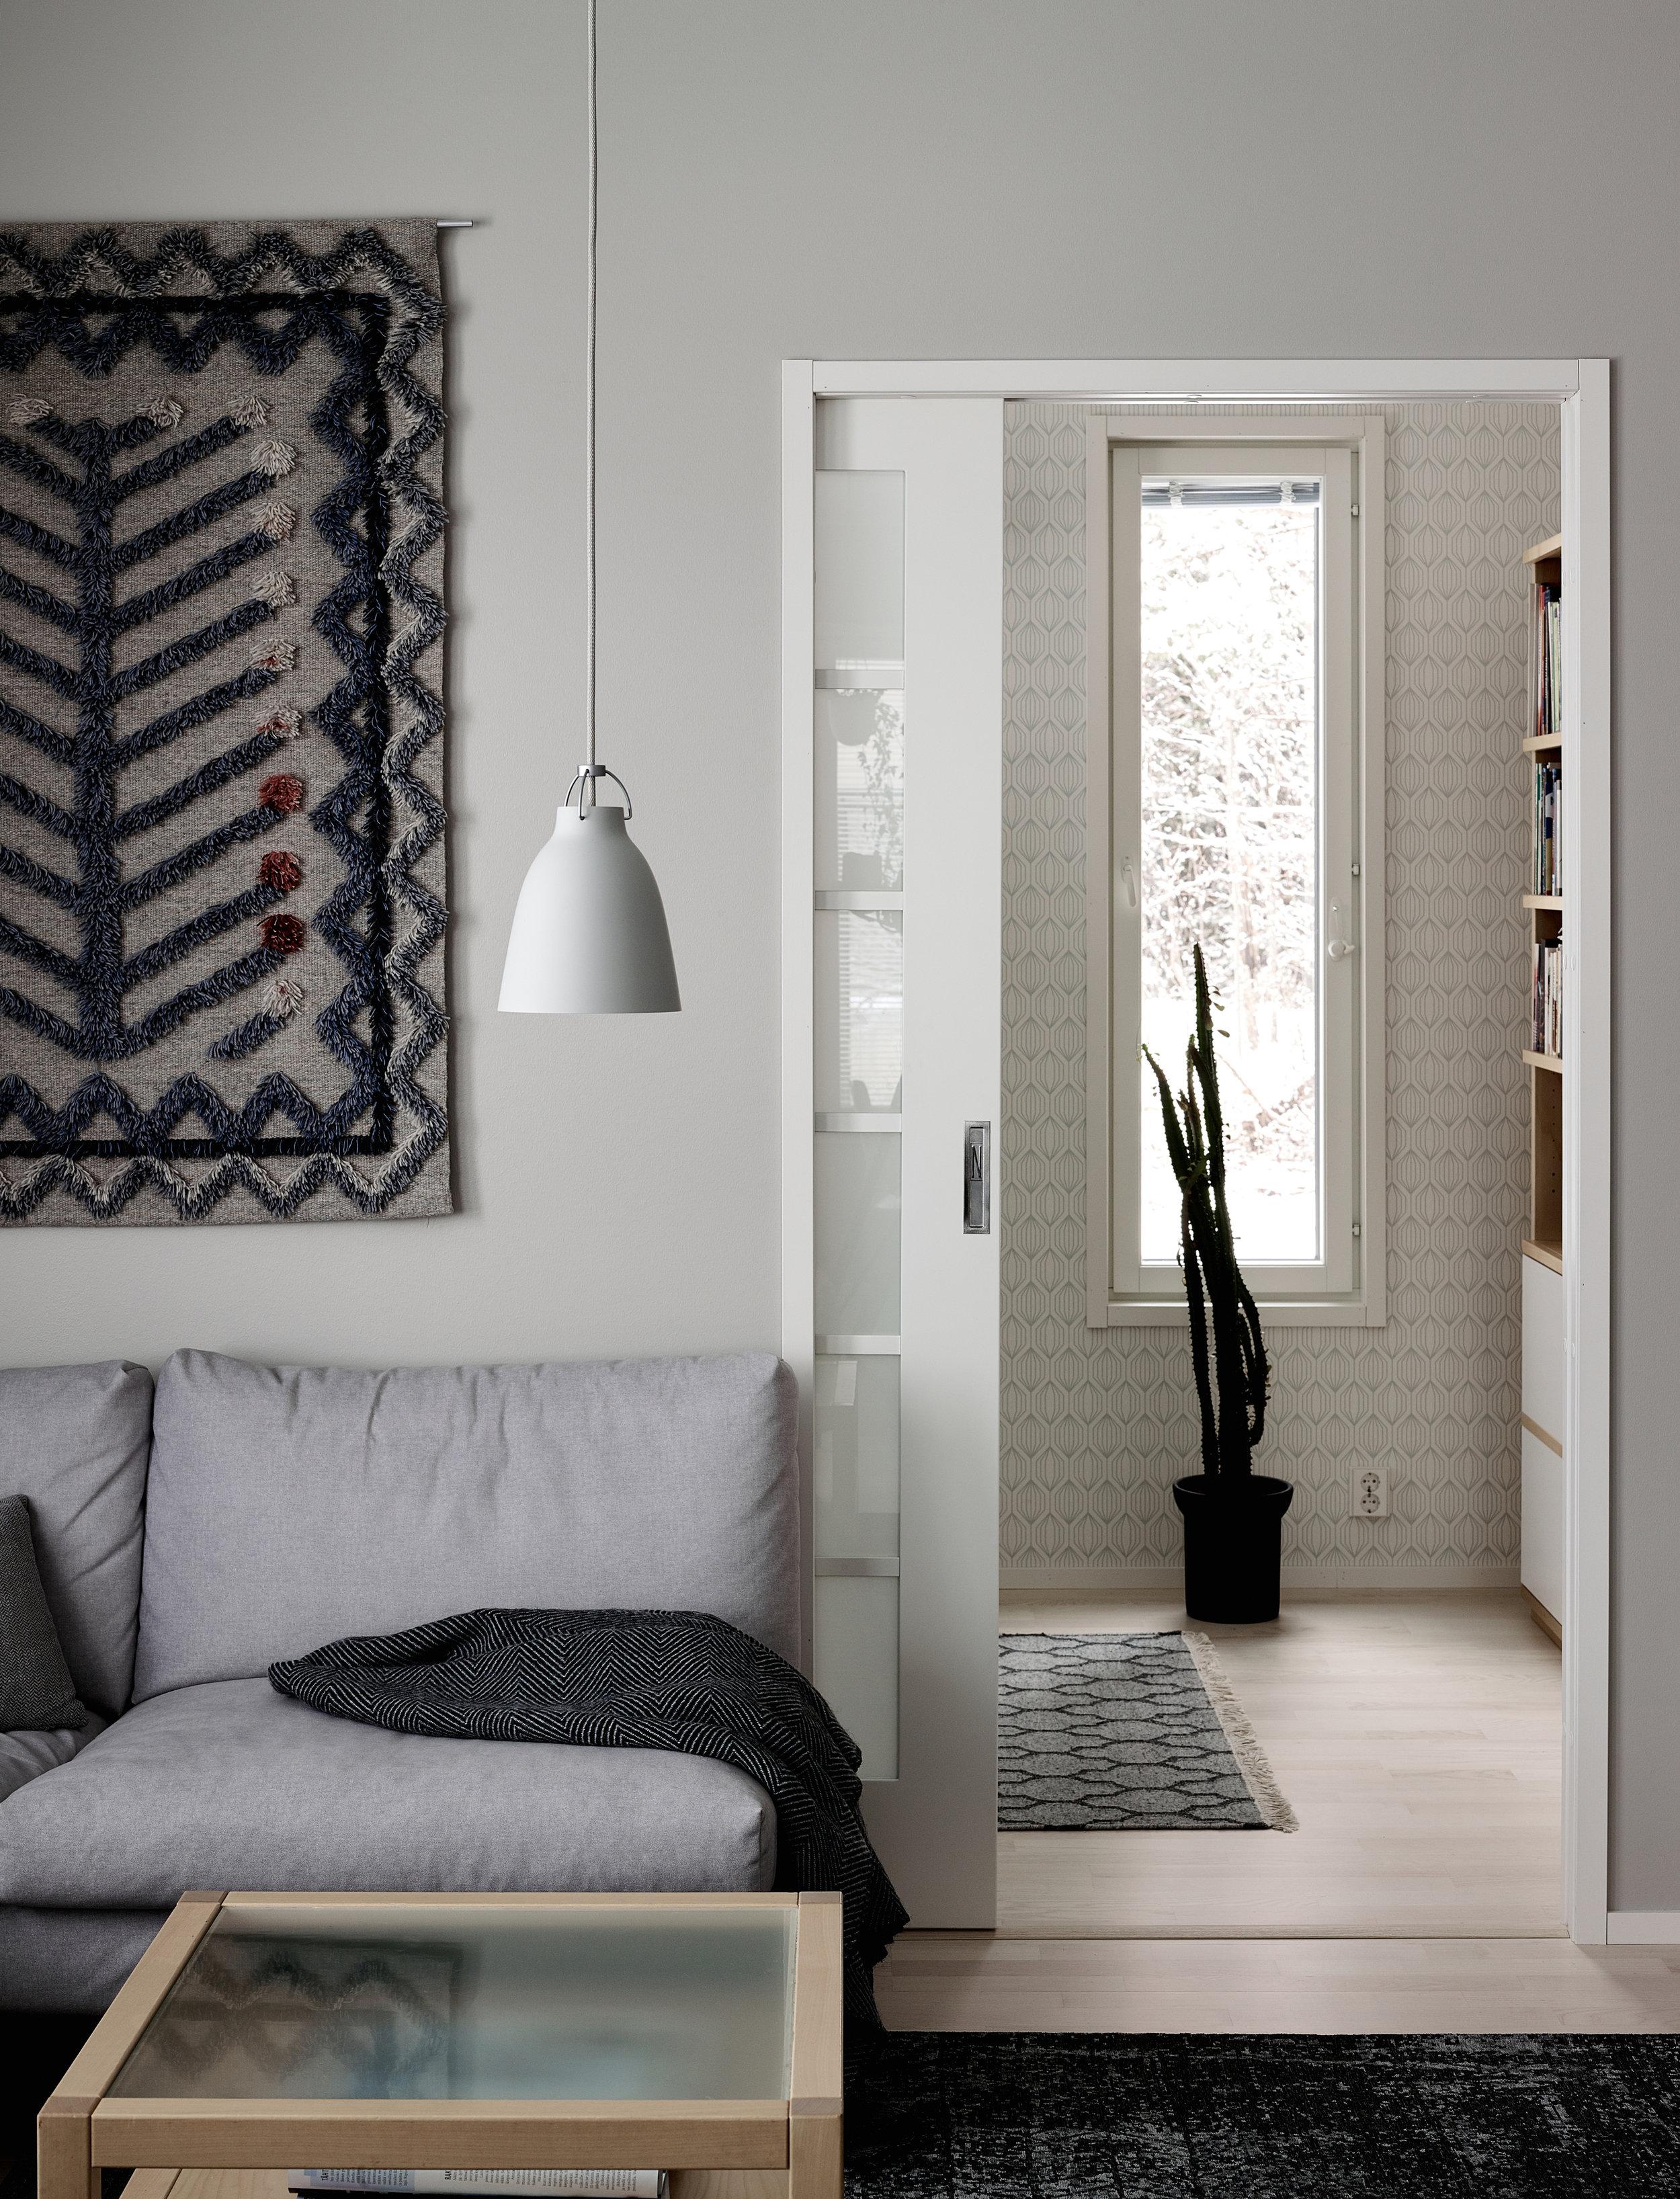 interior-anna-koponen-photo-krista-keltanen-08.jpg